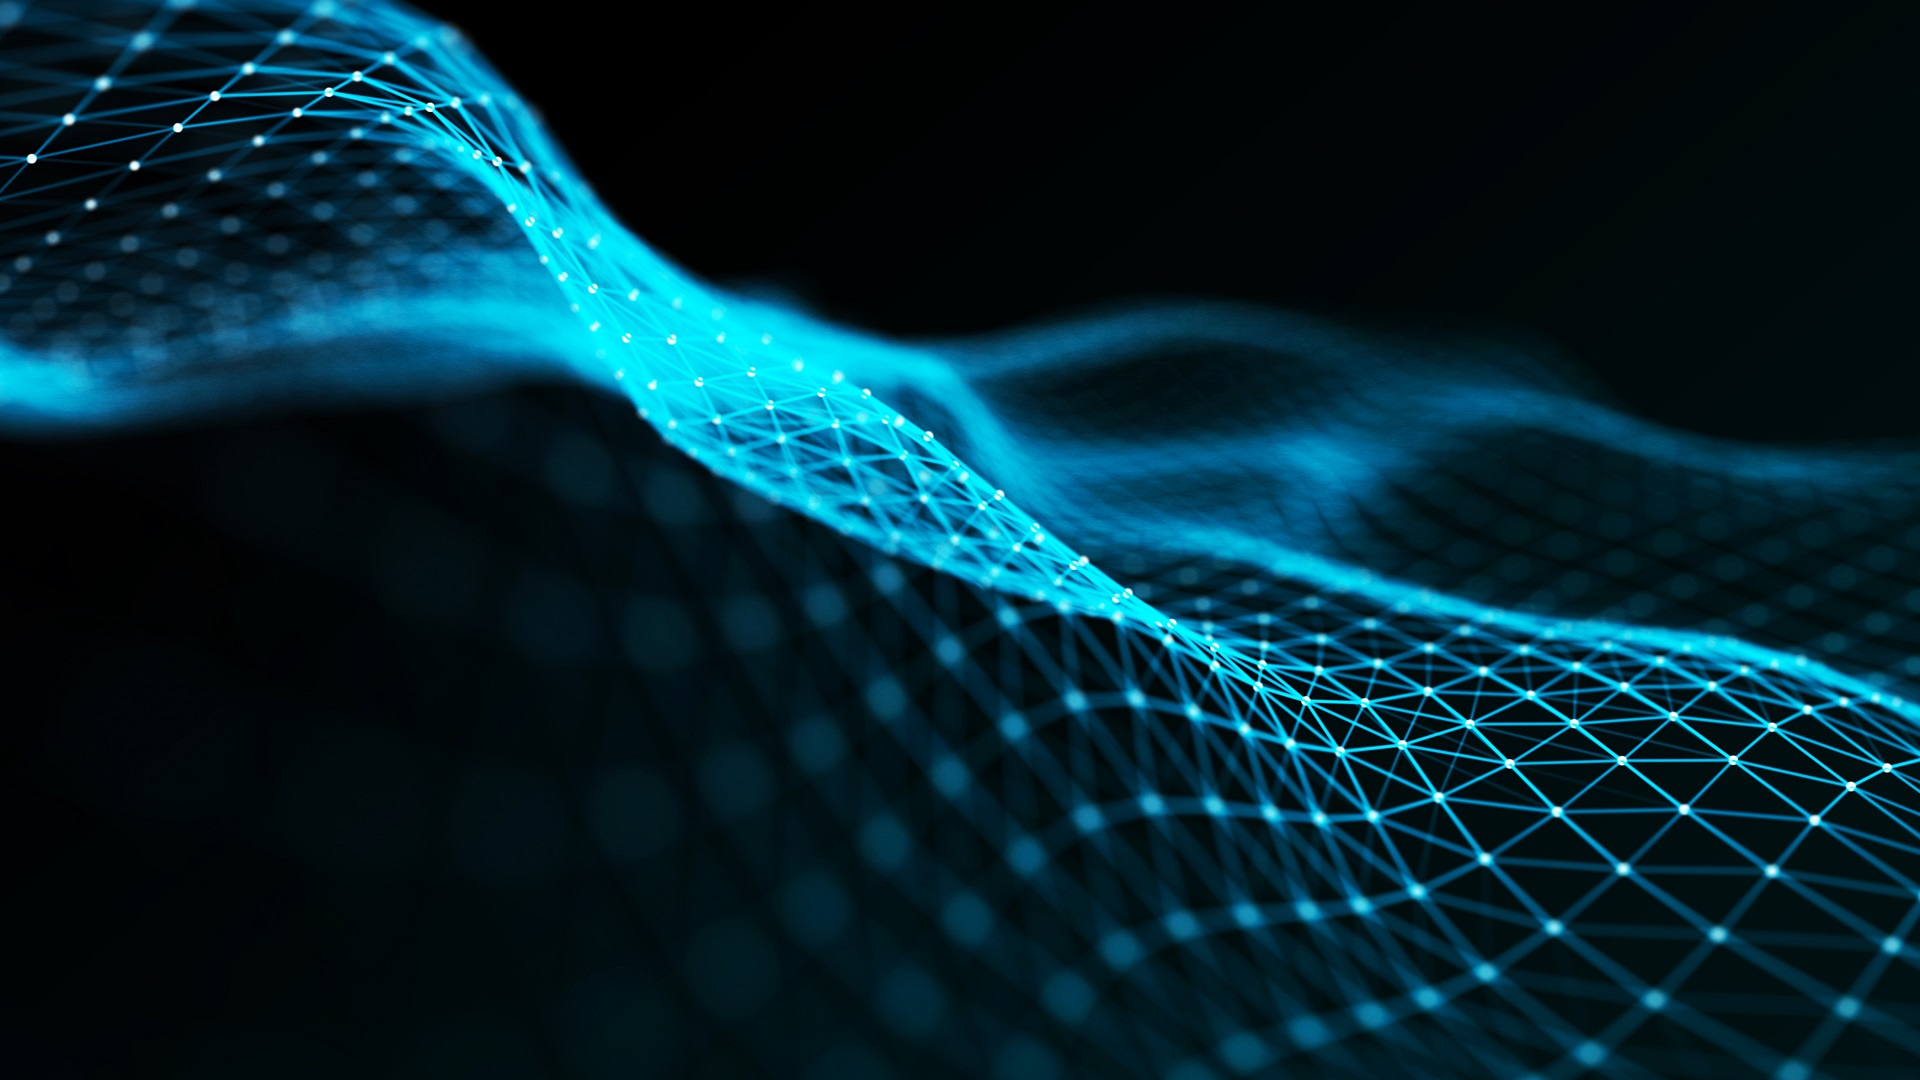 Nanoport at IEEE World Haptics